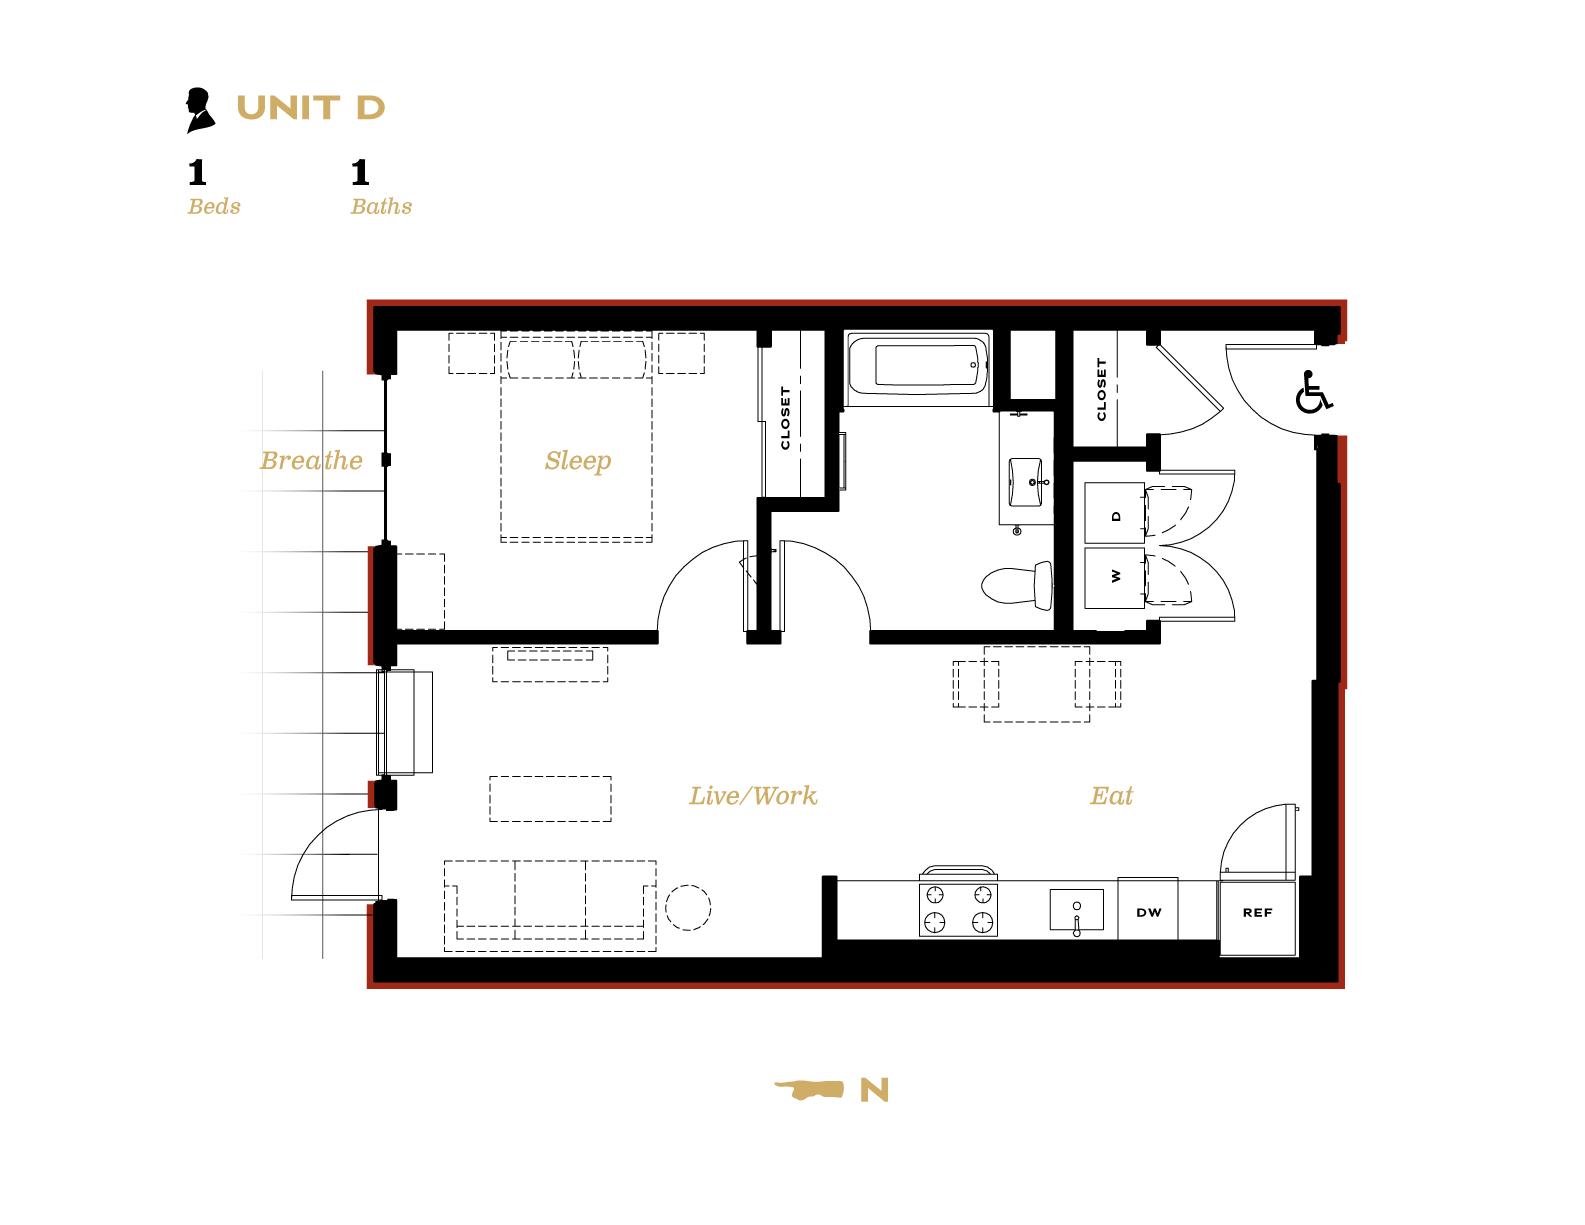 Unit D Unit D One bedroom with one bath floor plan